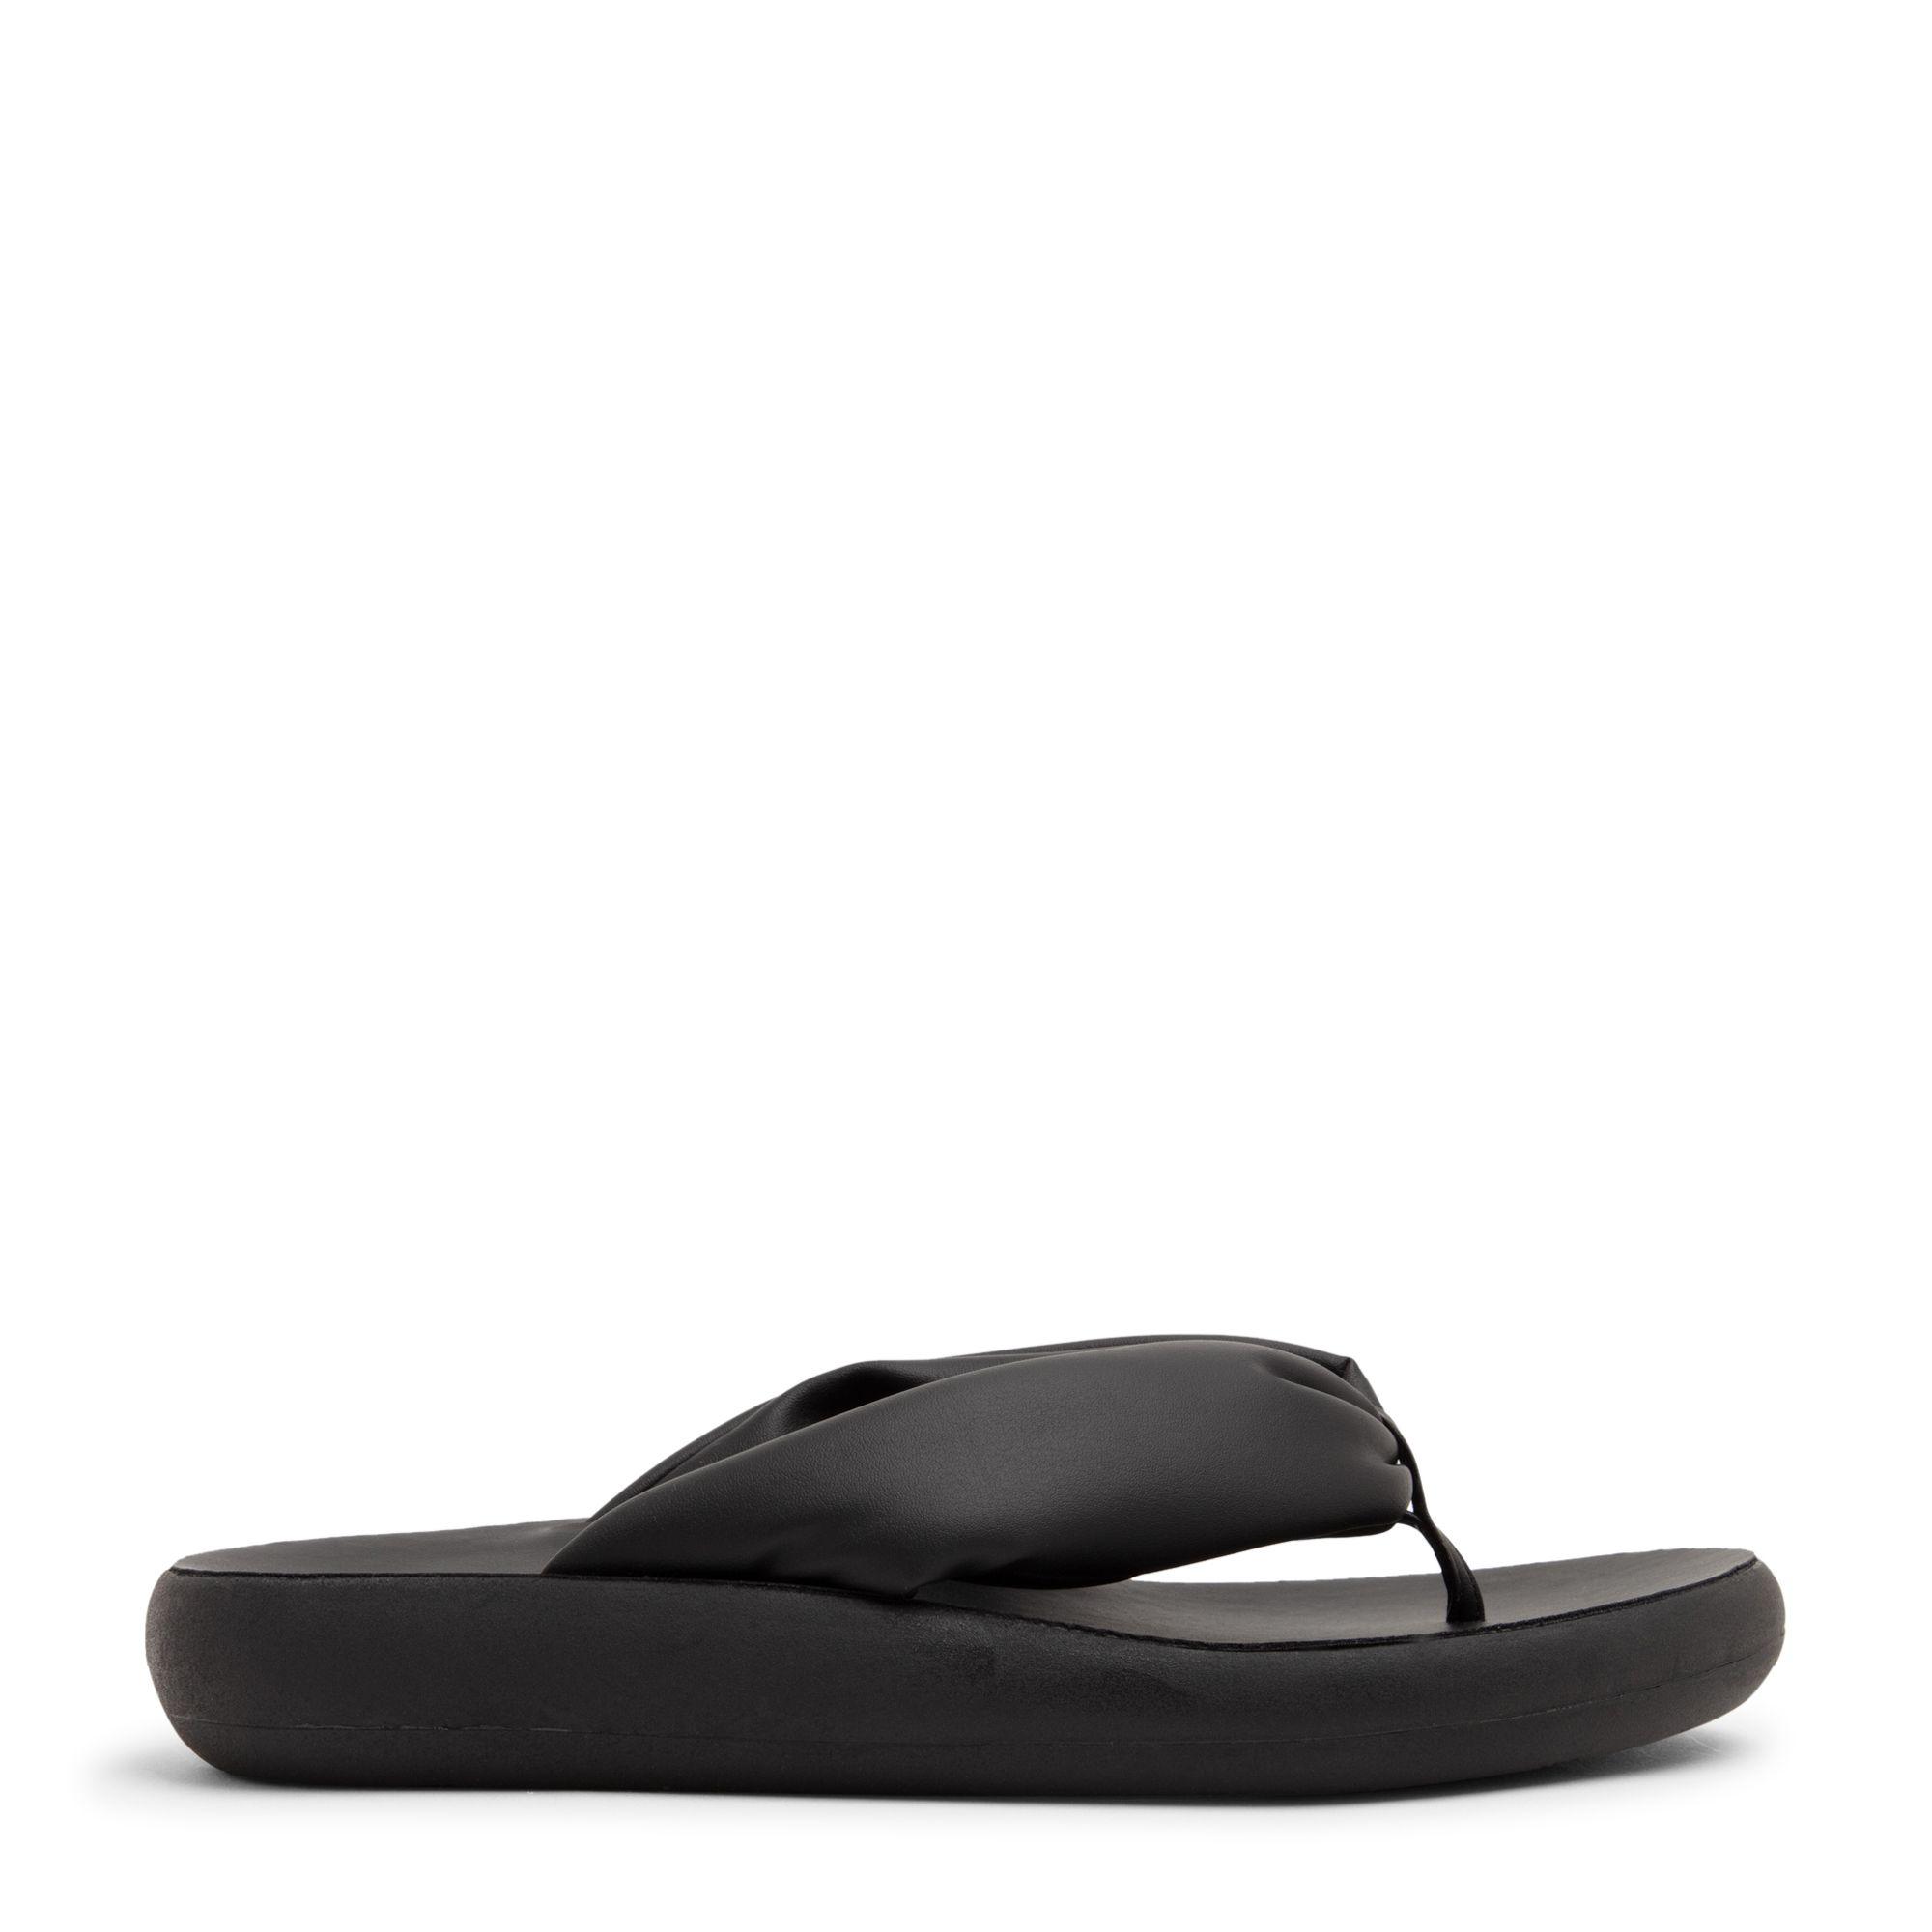 Charisma sandals